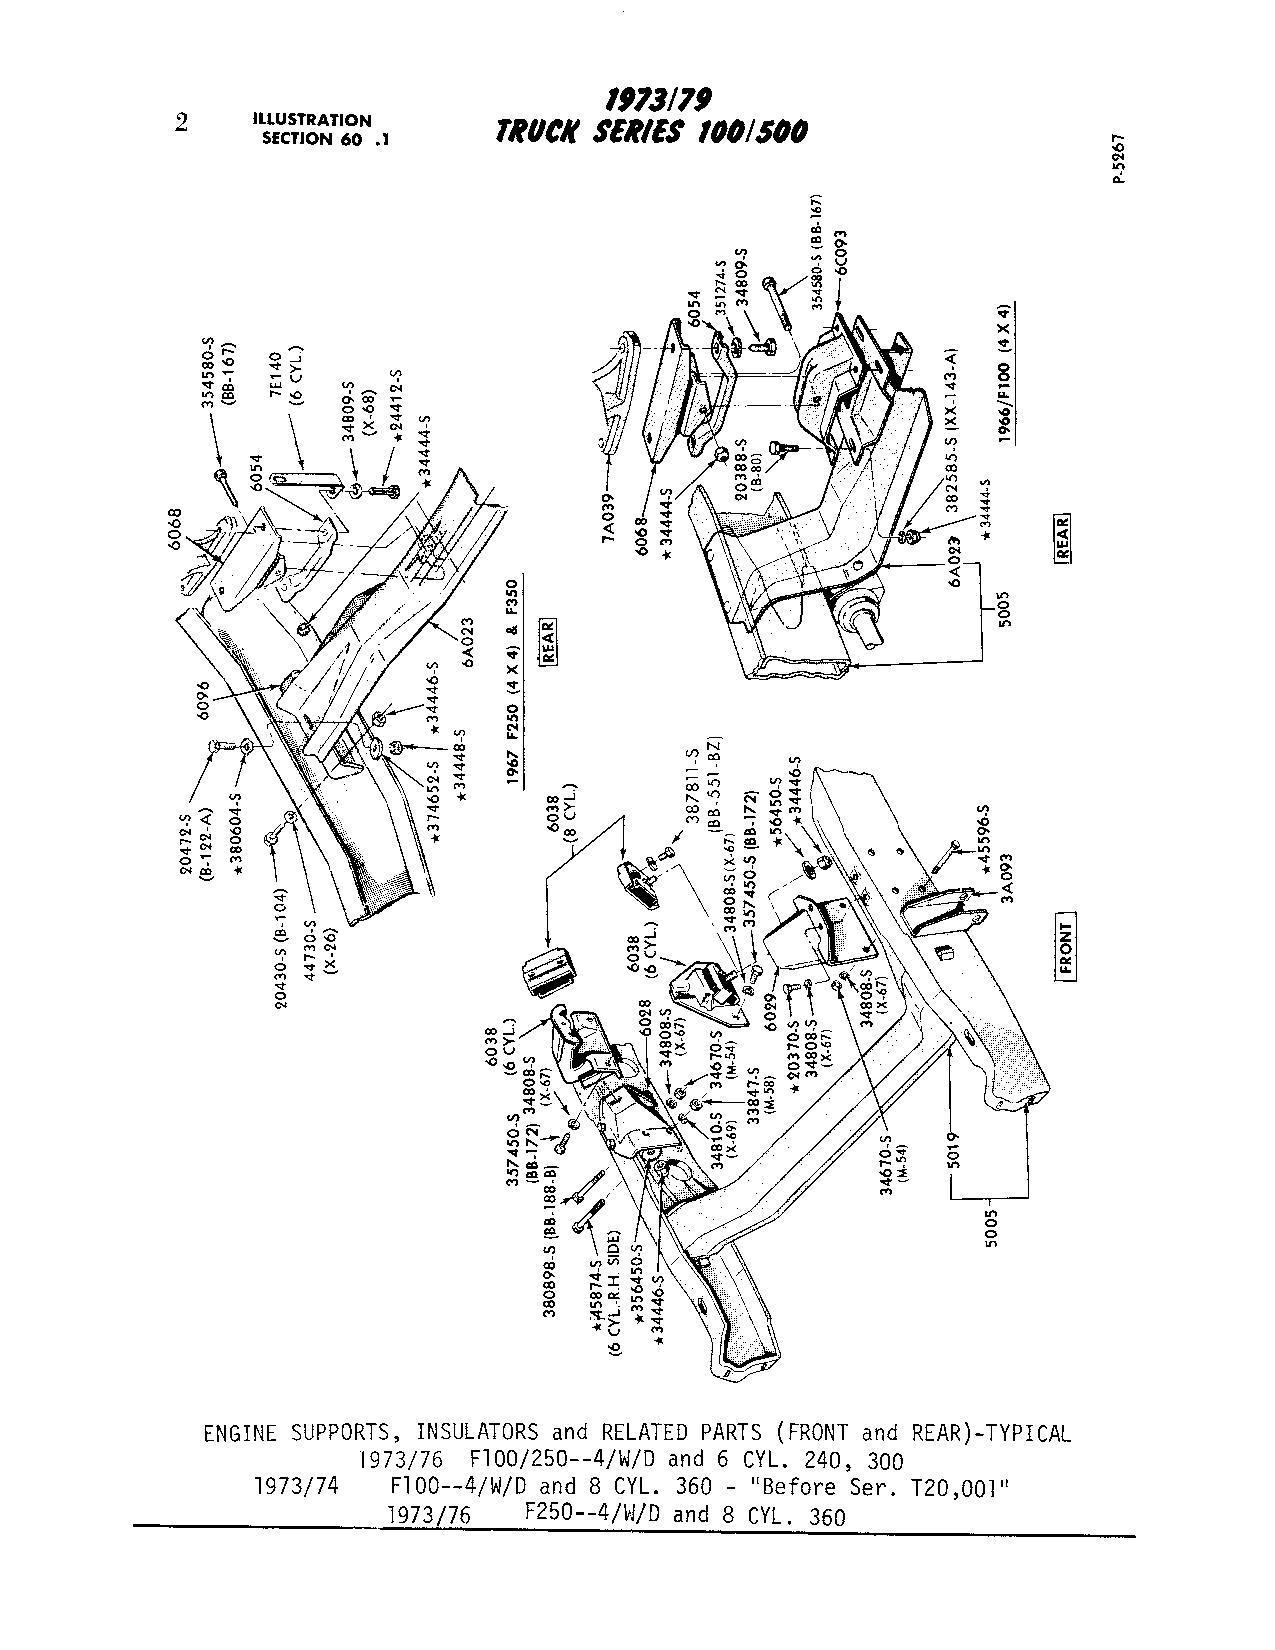 65 F100 4x4 Manual To Auto Trans Conversion